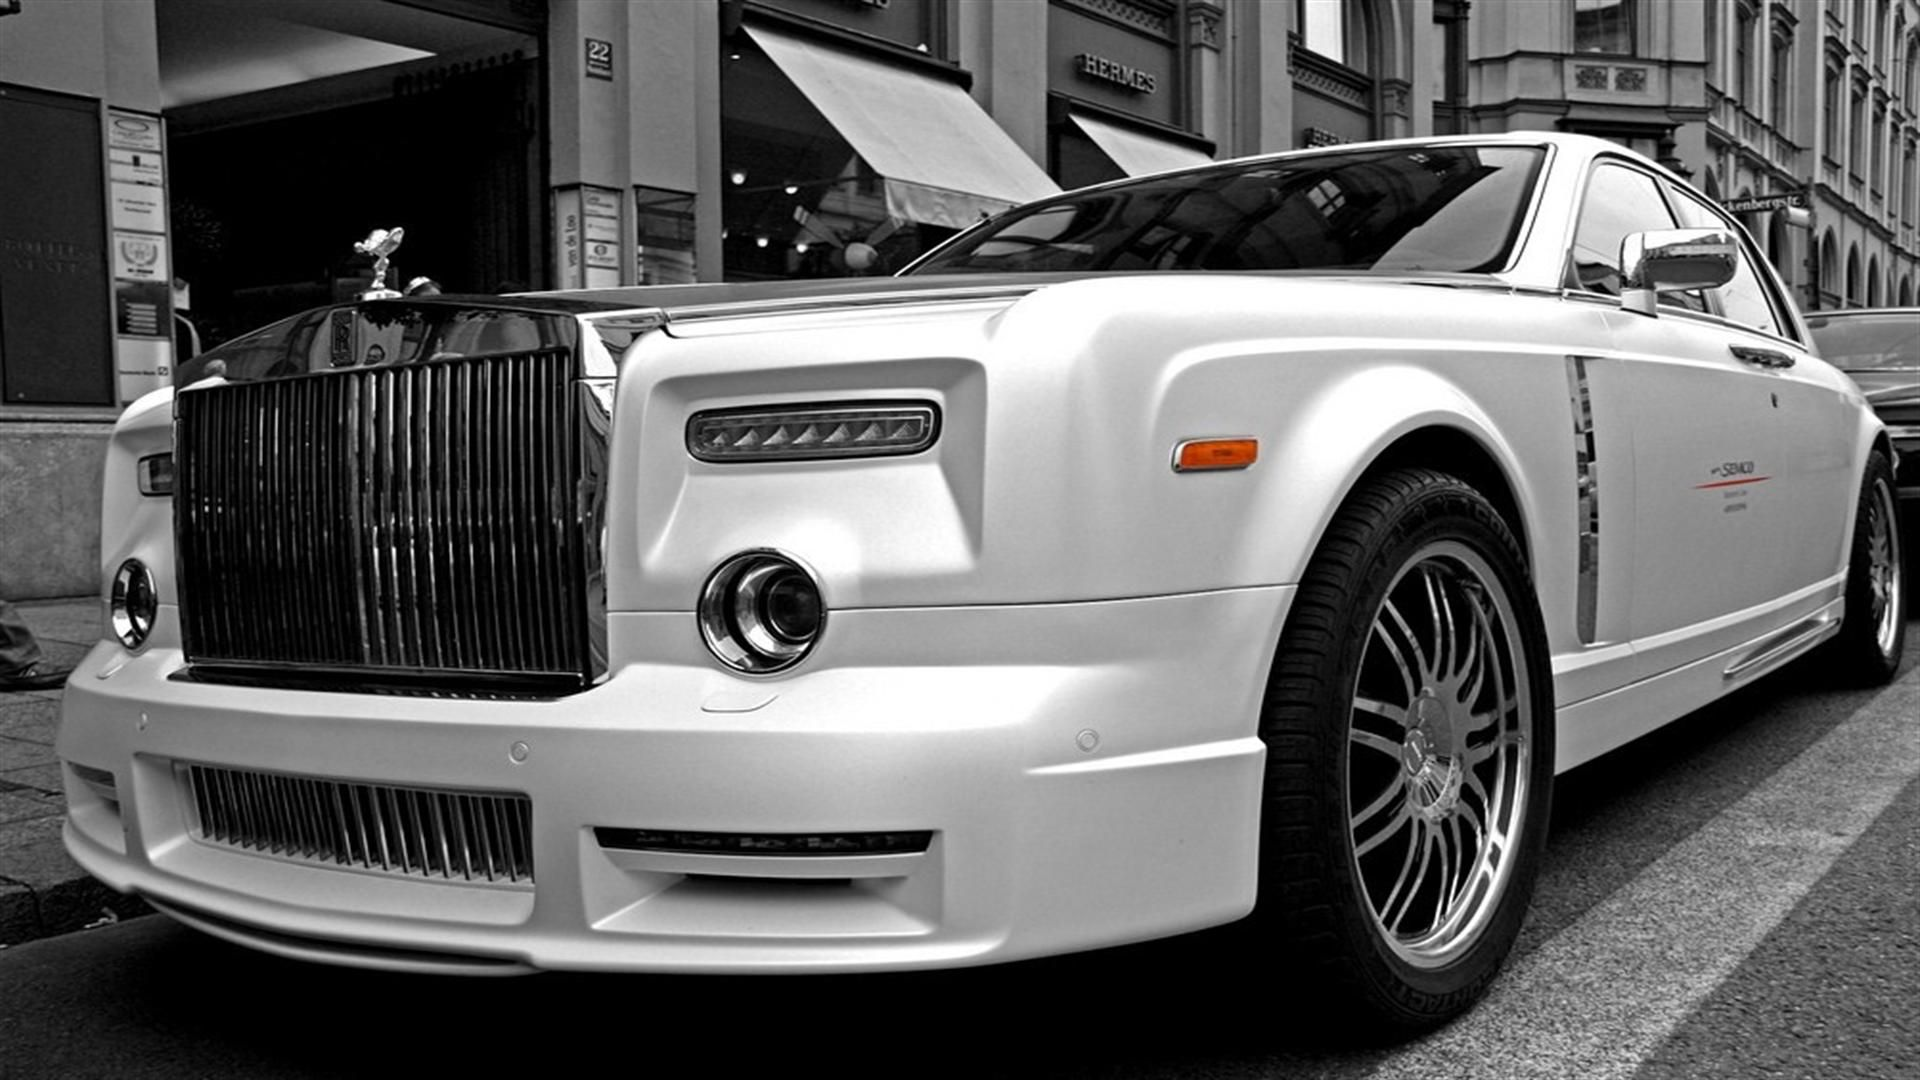 Rolls Royce 8 Jpg 1920 1080 Rolls Royce Rolls Royce Phantom